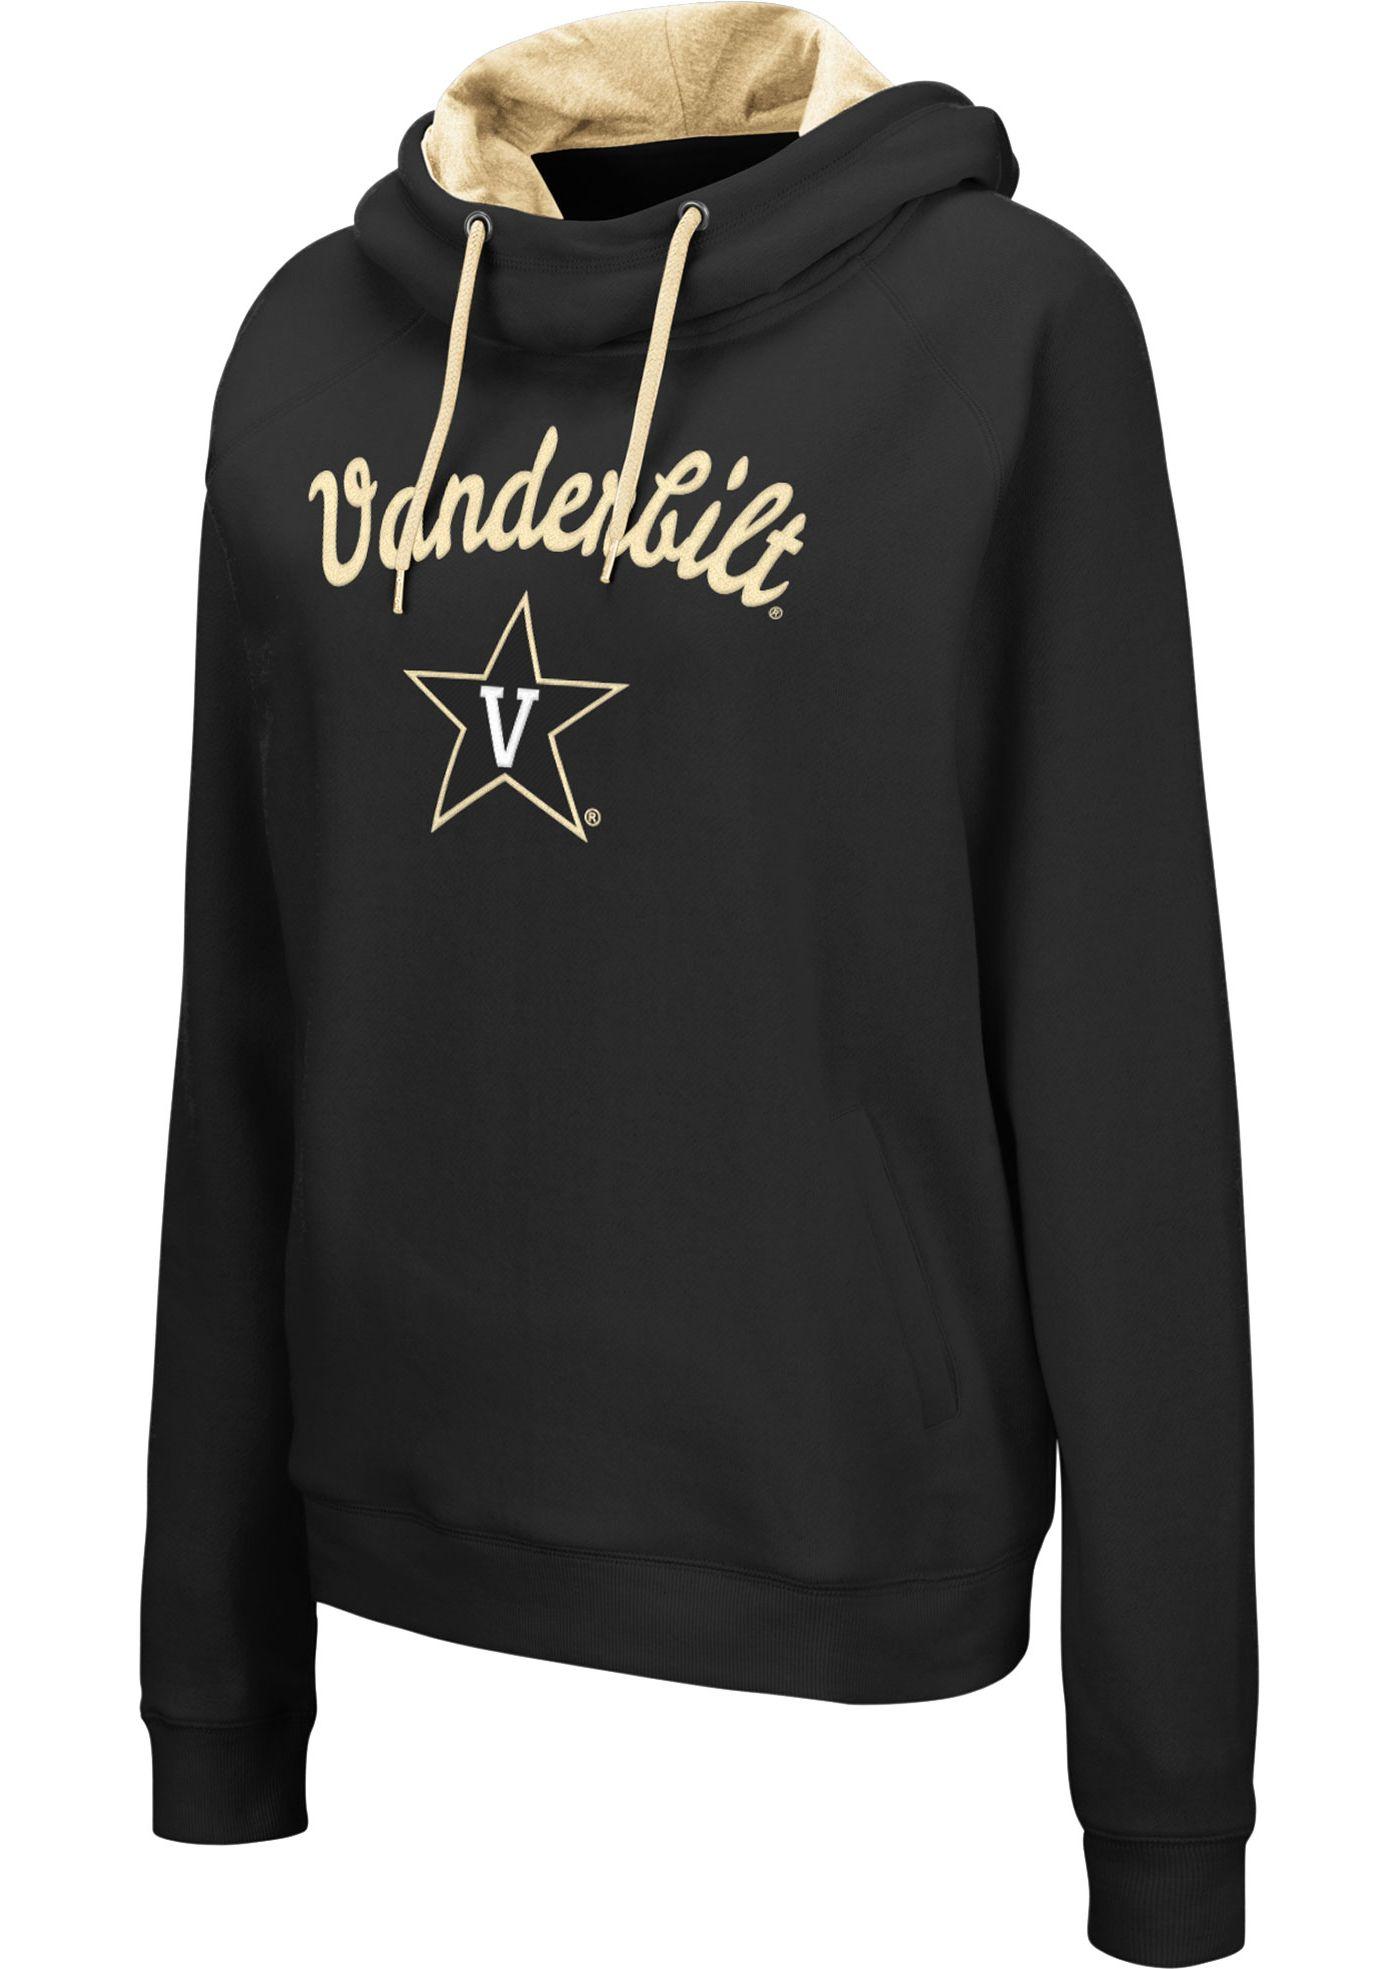 Colosseum Women's Vanderbilt Commodores Louise Pullover Black Sweatshirt